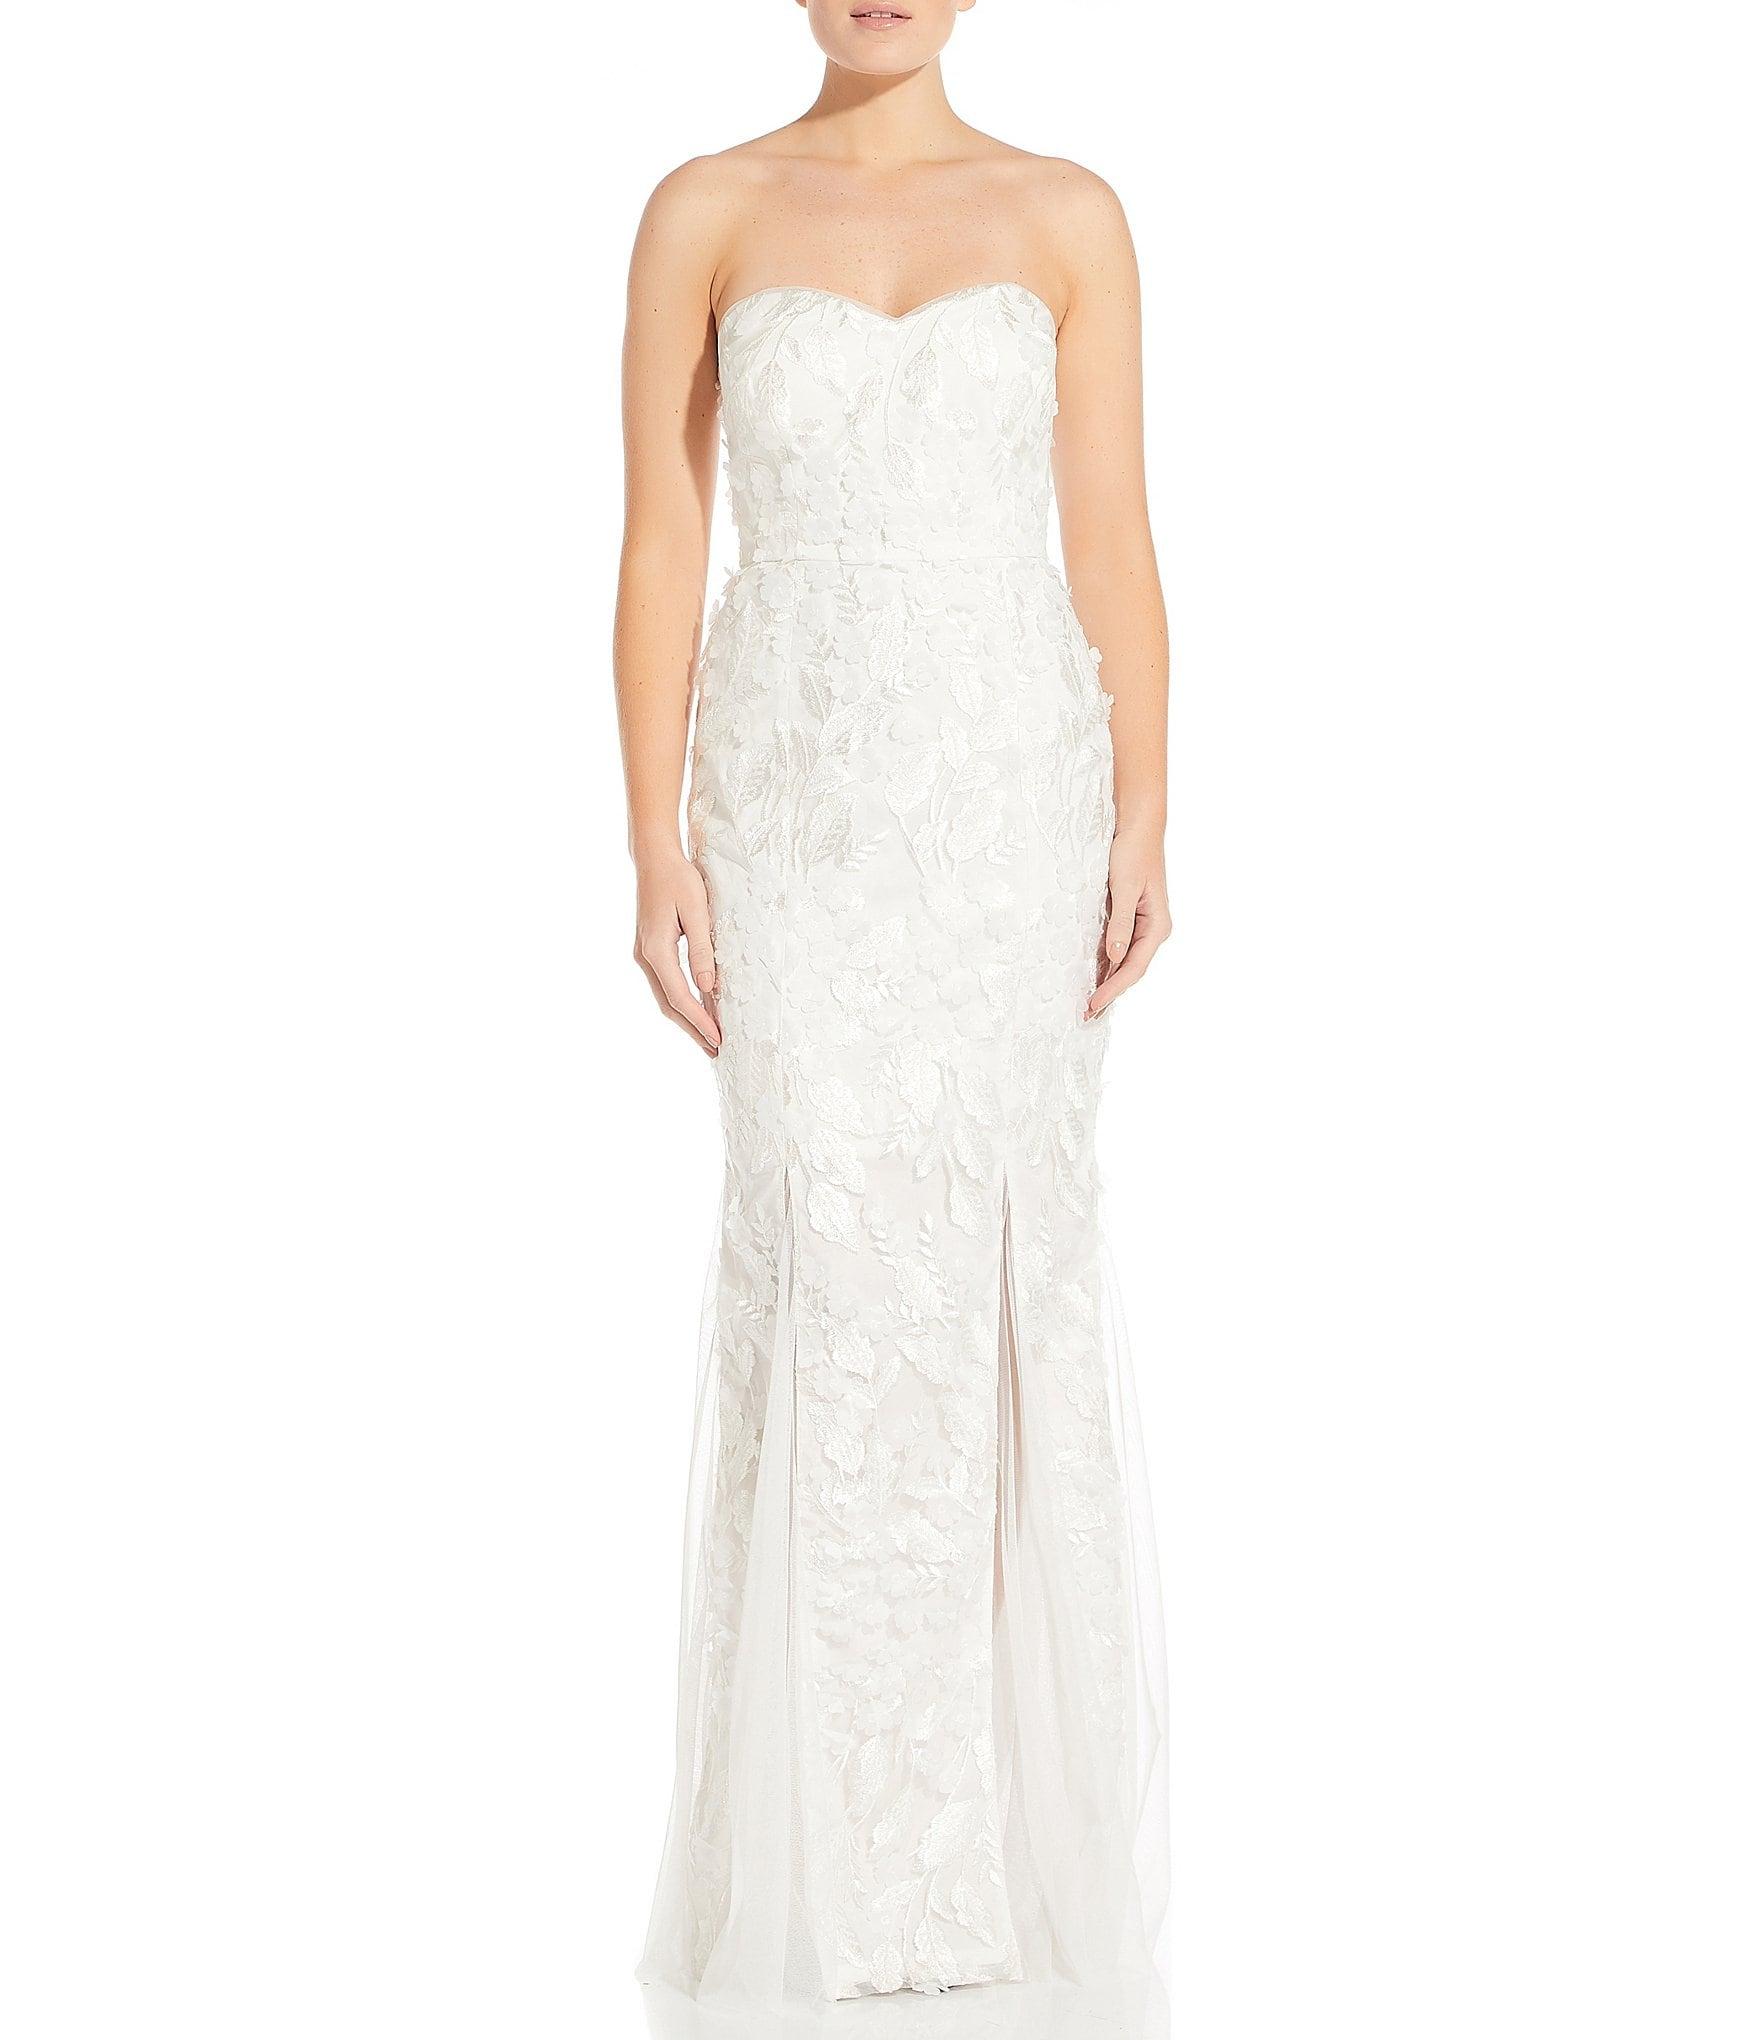 Women S Wedding Dresses Bridal Gowns Dillard S